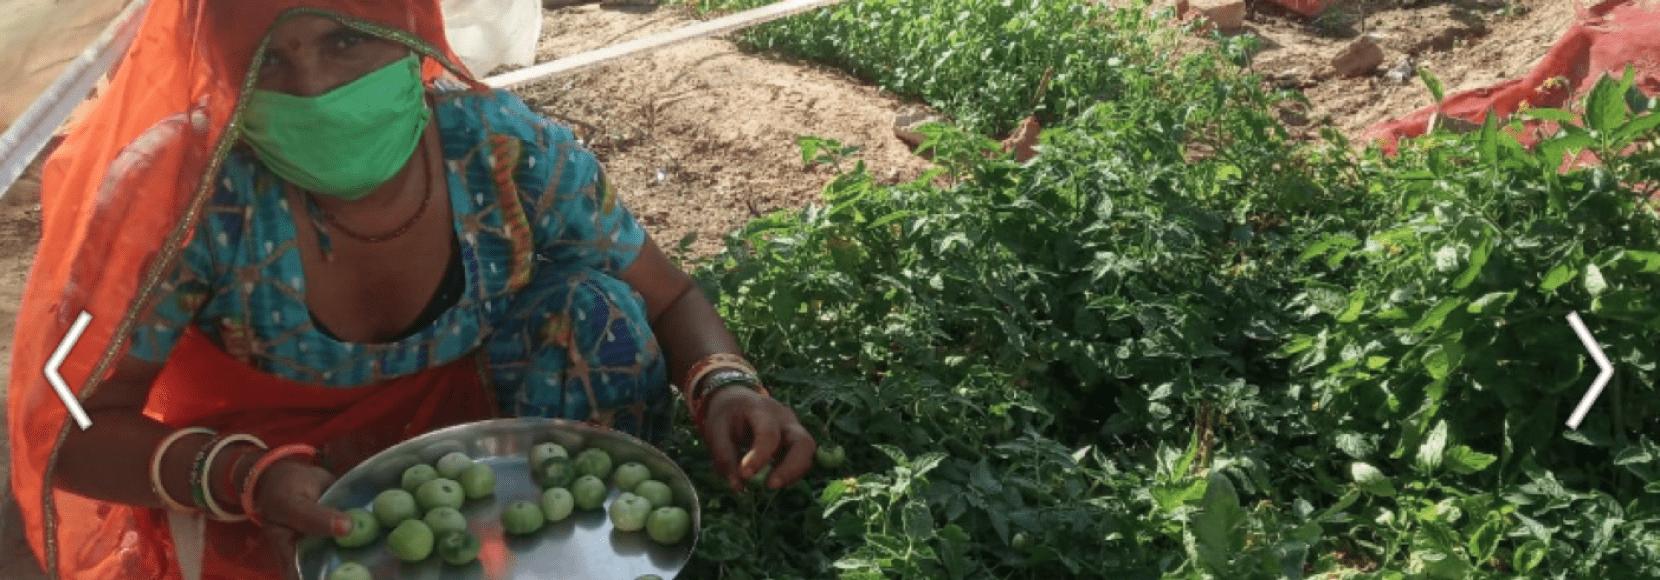 Indian woman farming